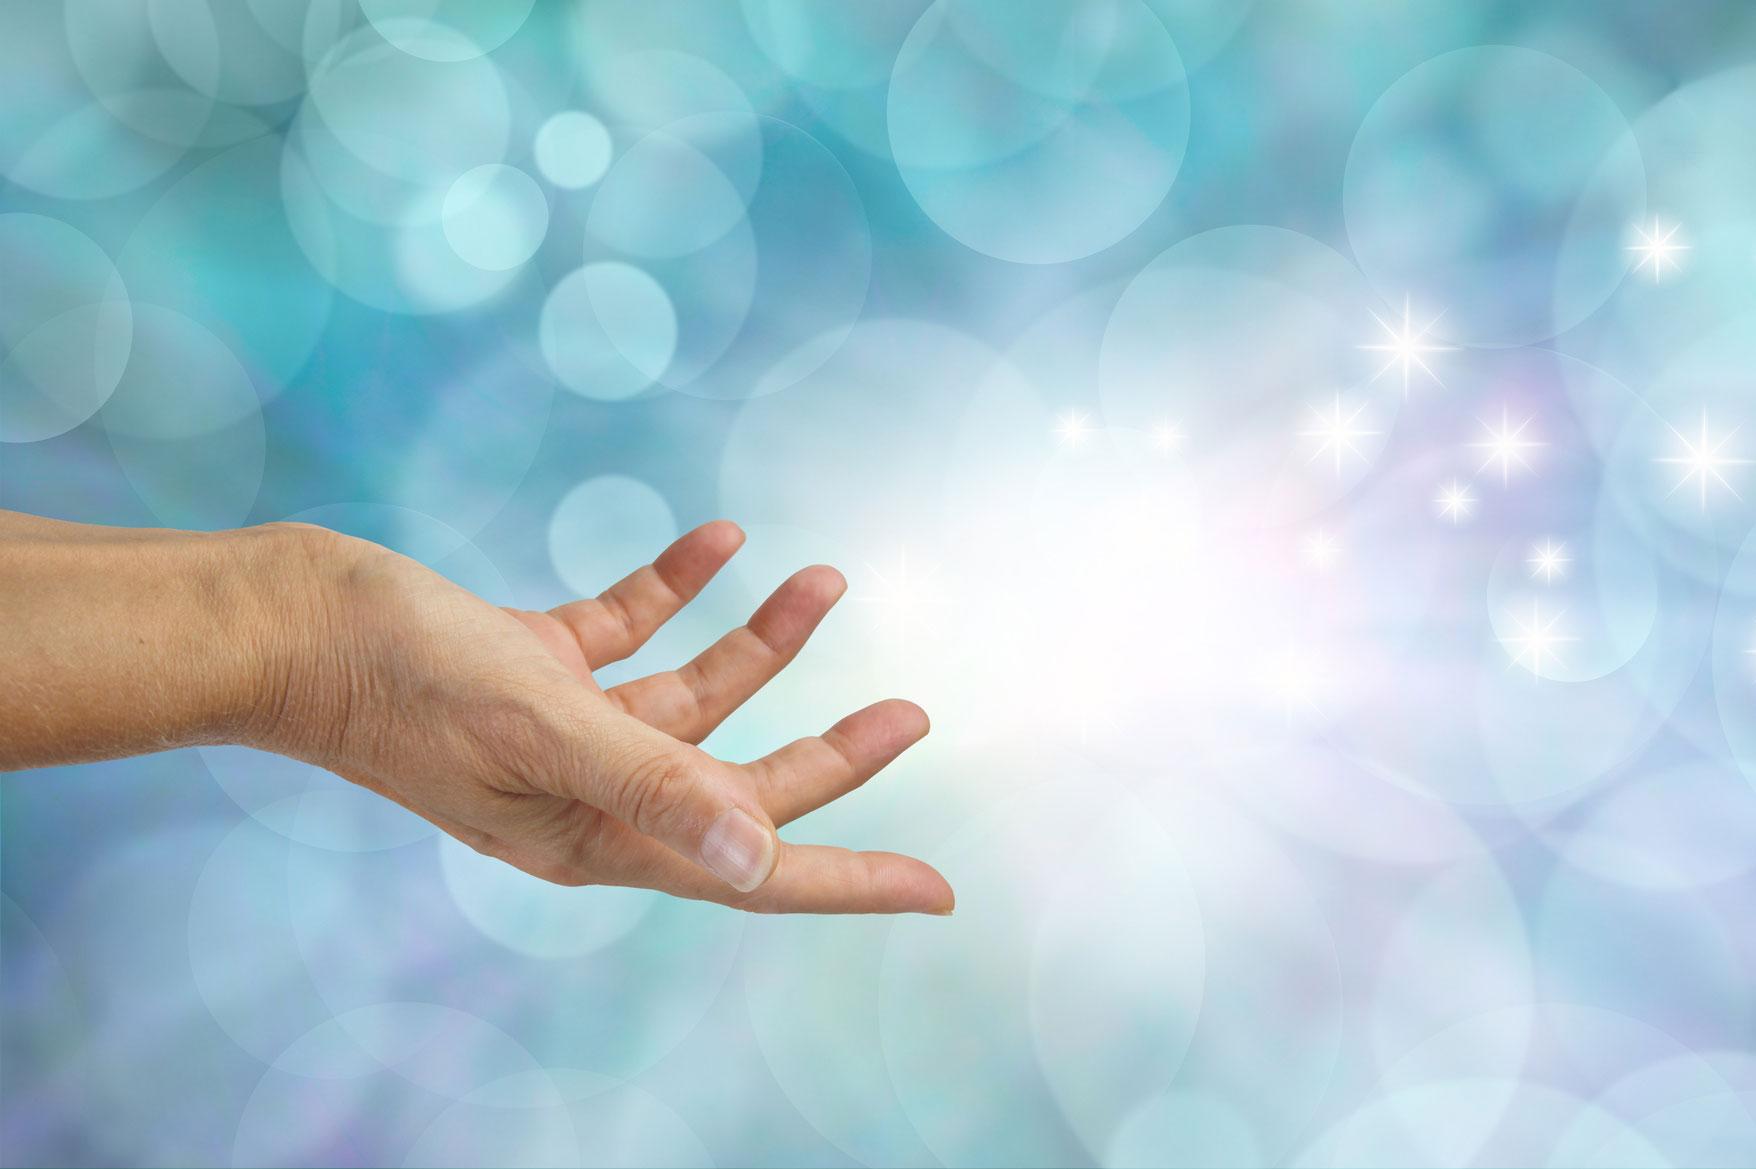 Spiritualità: i 5 principi Rieki per la pace interiore